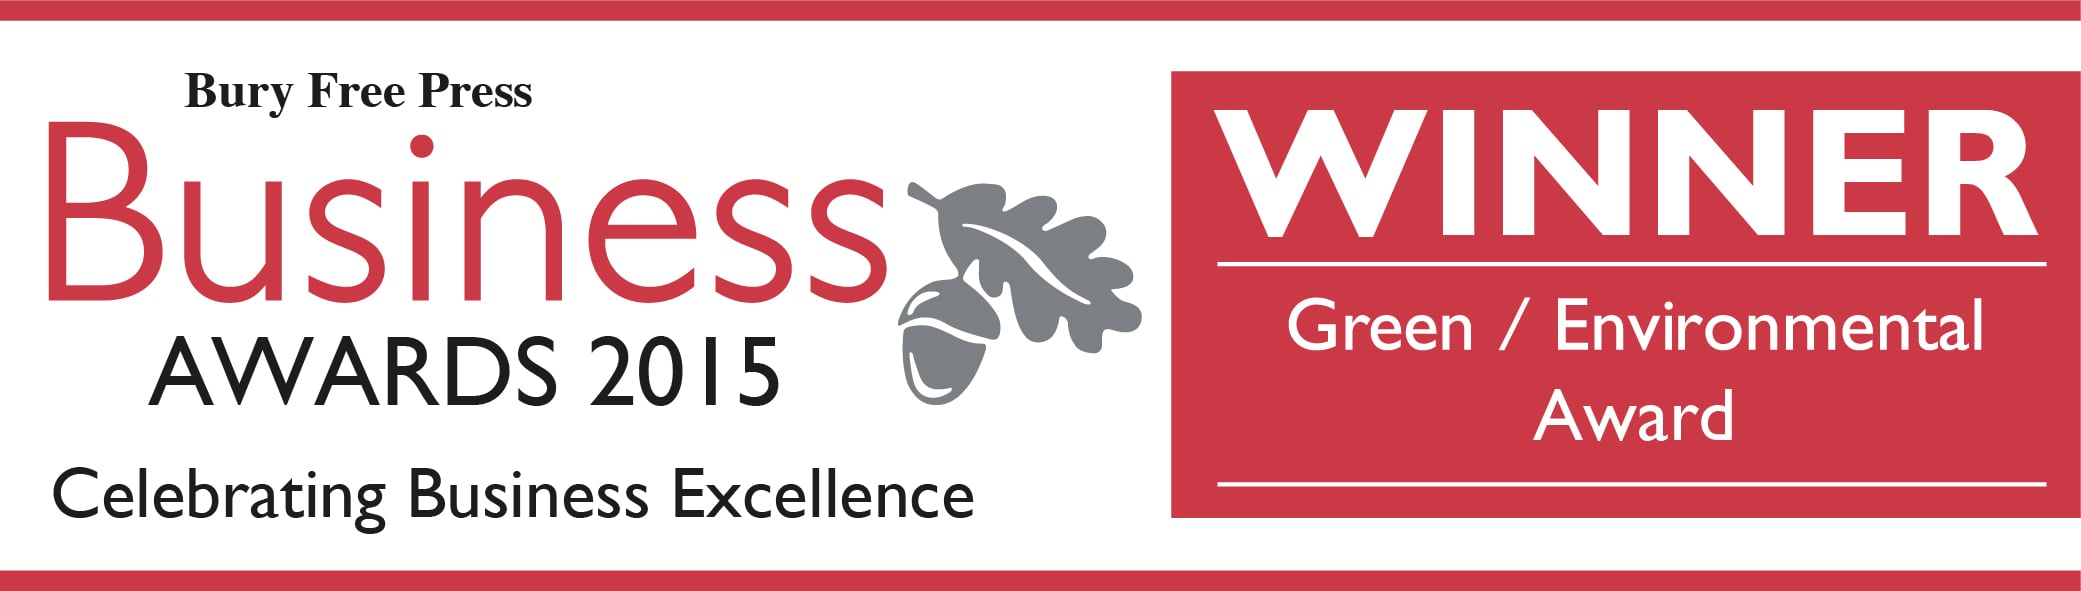 Bury free press business awards 2015 Green/environmental award winner: Precision